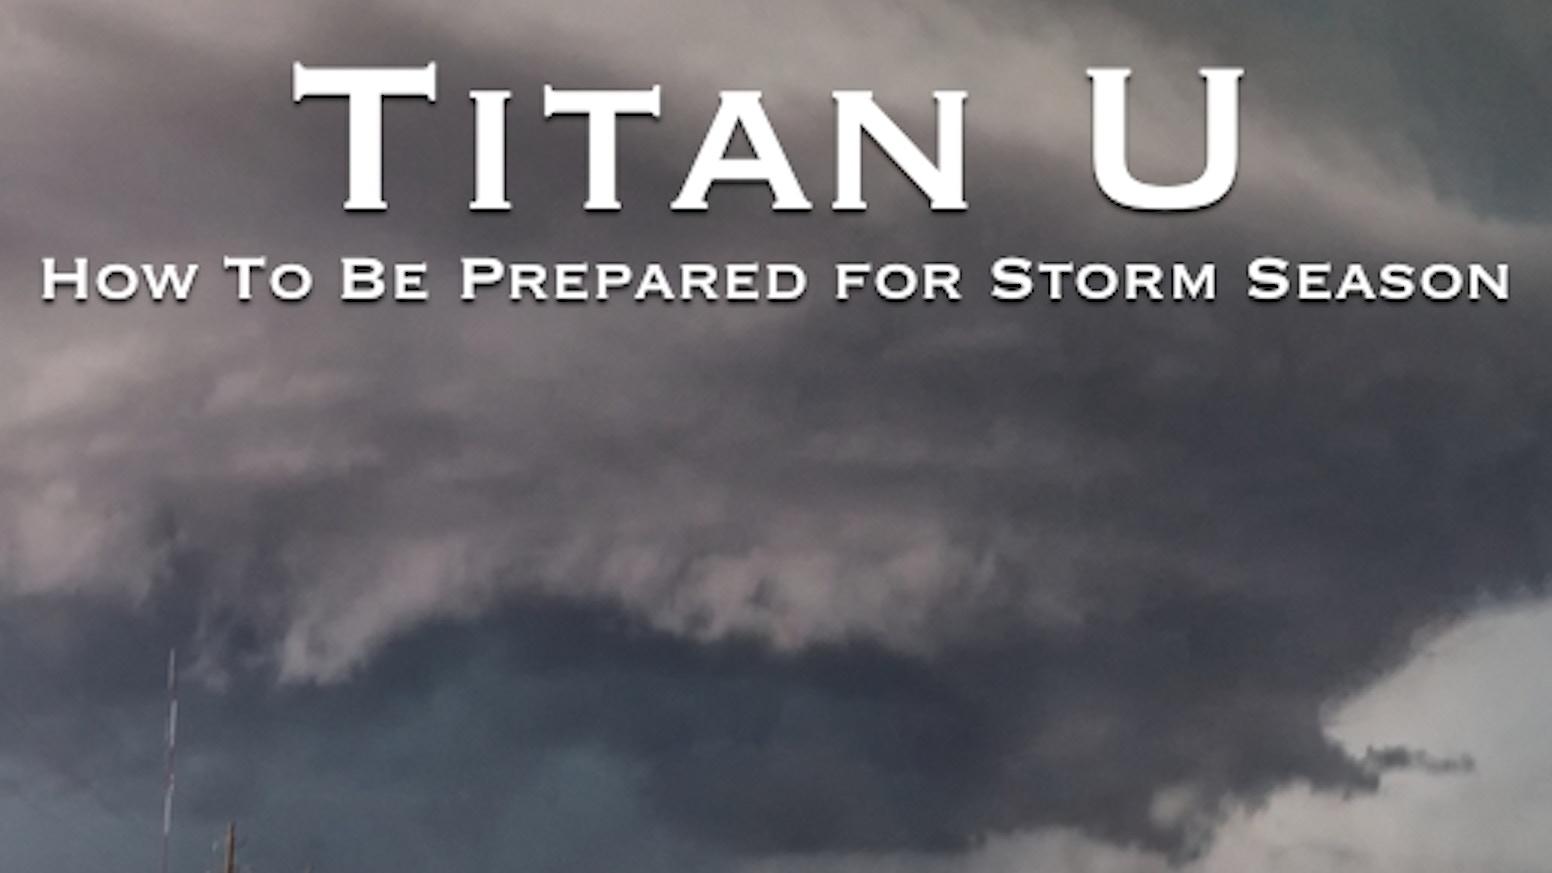 Titan U: Storm Preparedness Training Films & Web Experience by